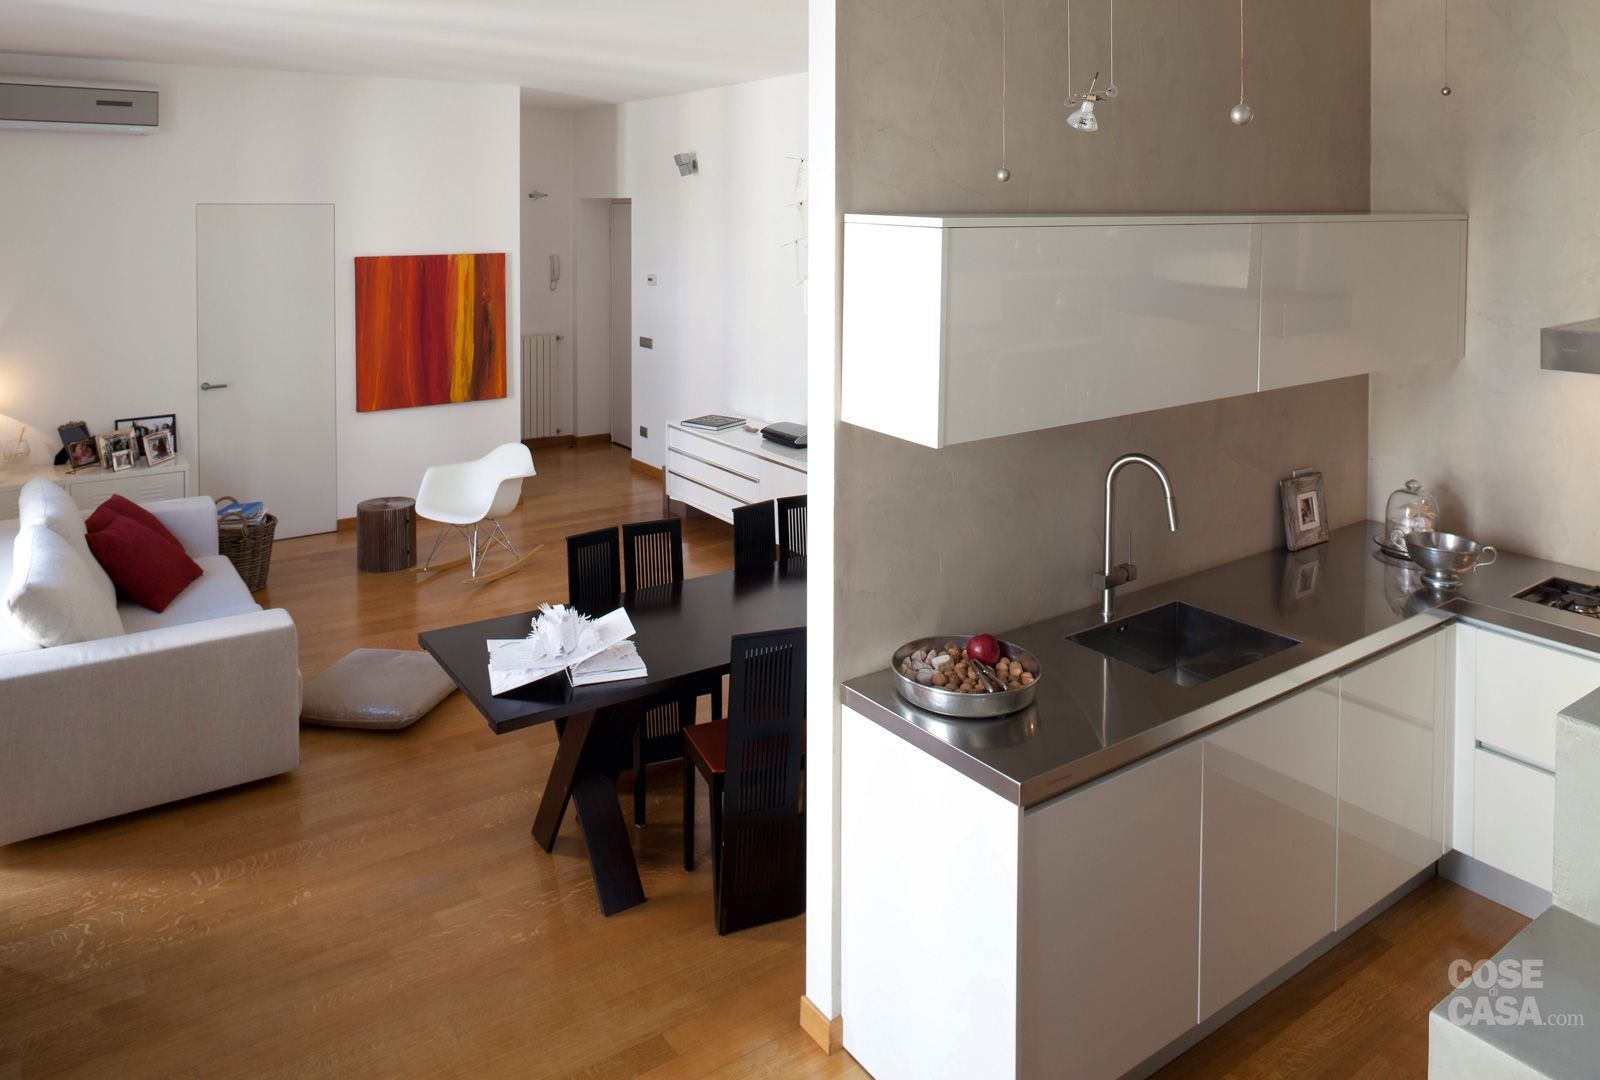 Sala Cucina 25 Mq una casa da copiare: 10 idee tra spunti d'arredo e decor